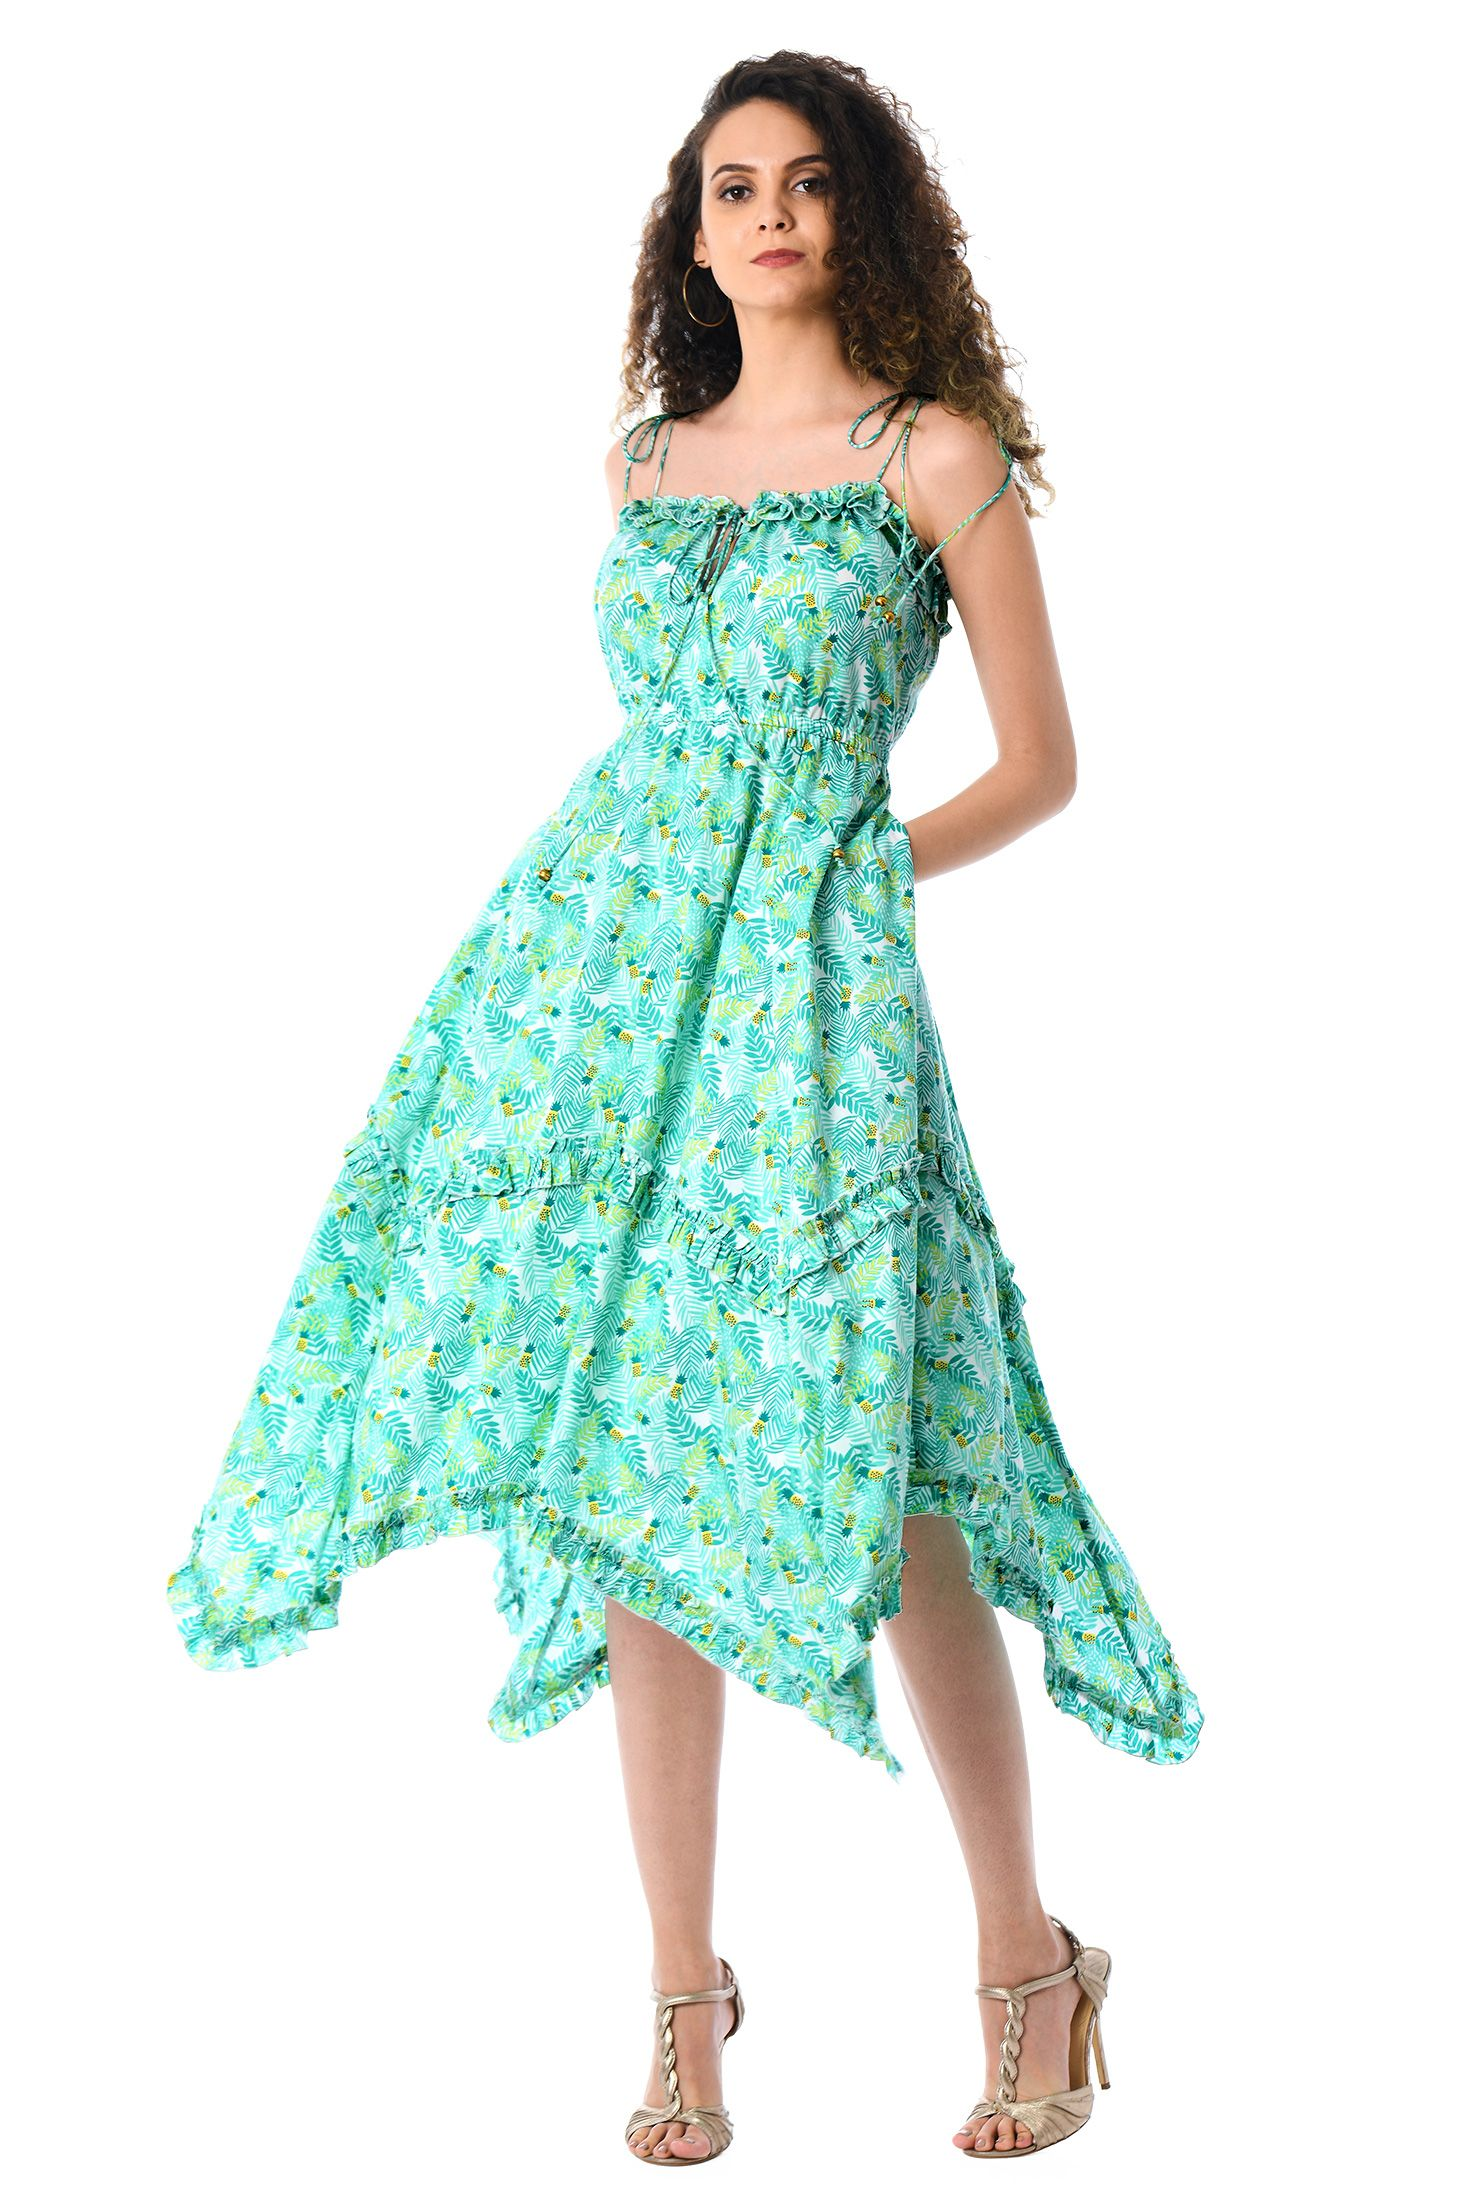 d52f5f5122 Online store of women s dresses